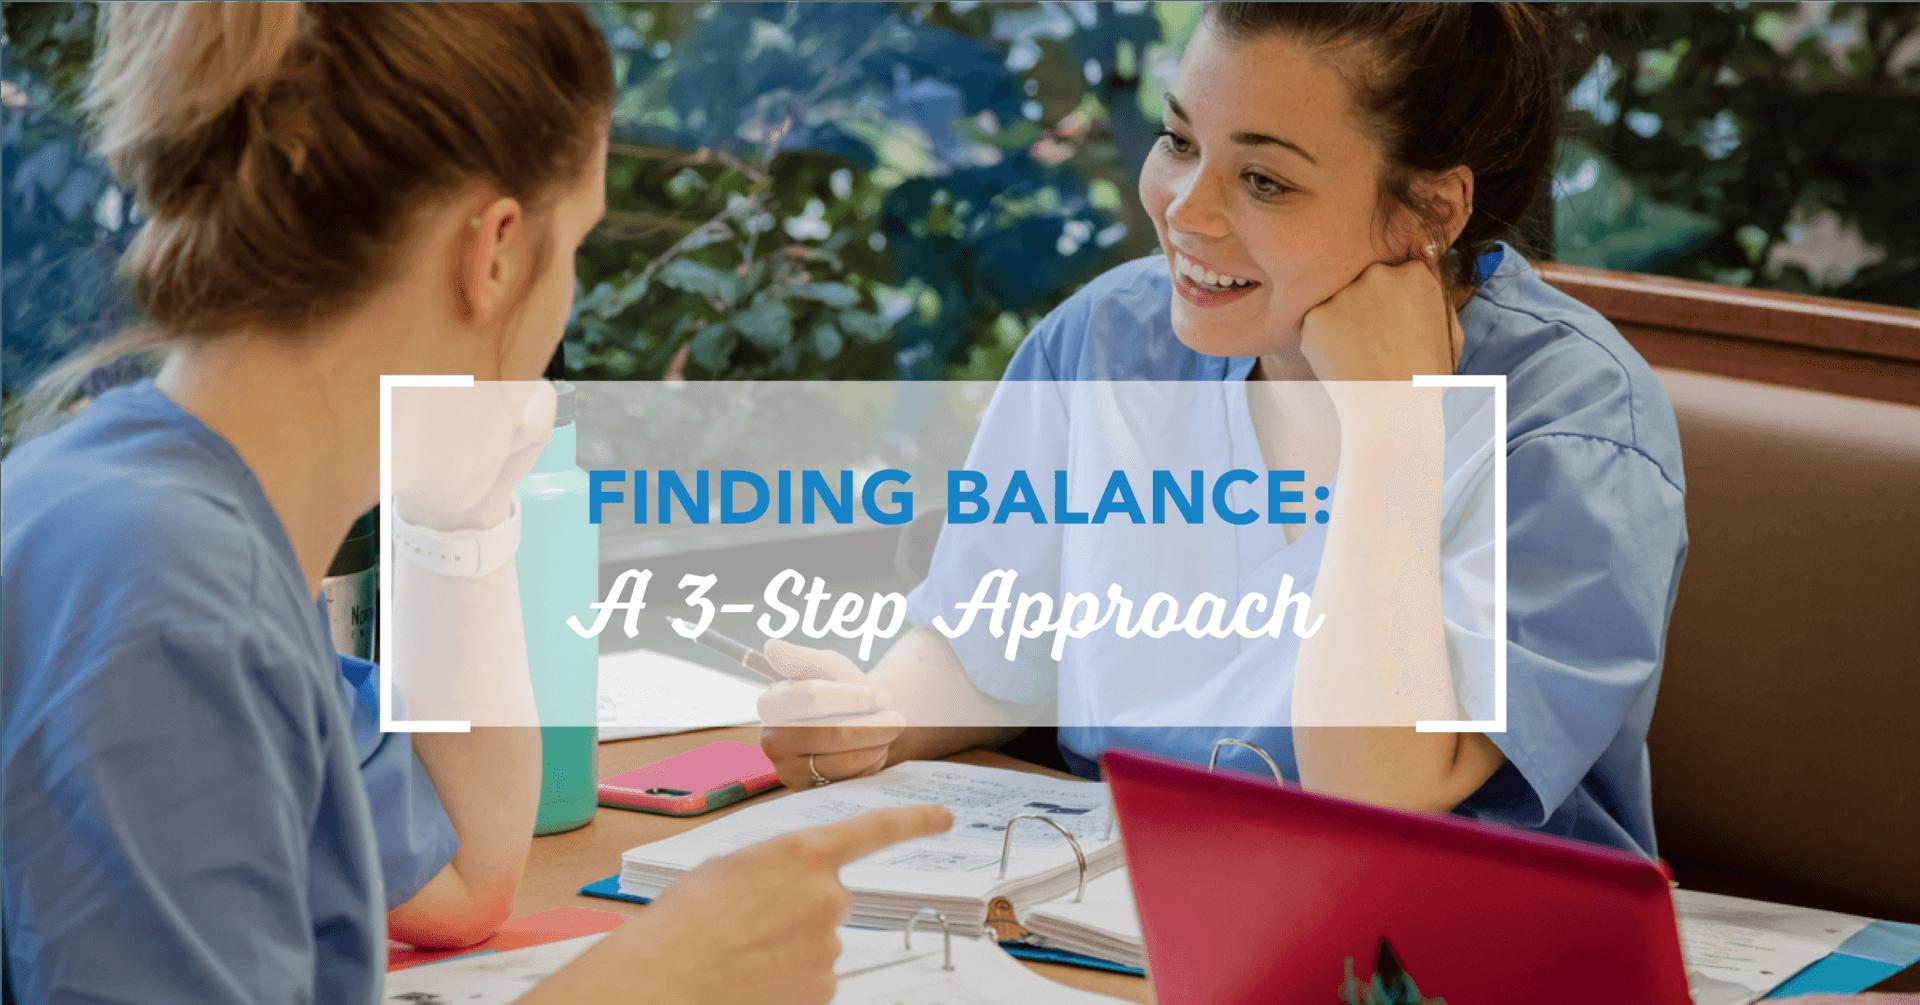 Finding Balance: A 3-Step Approach